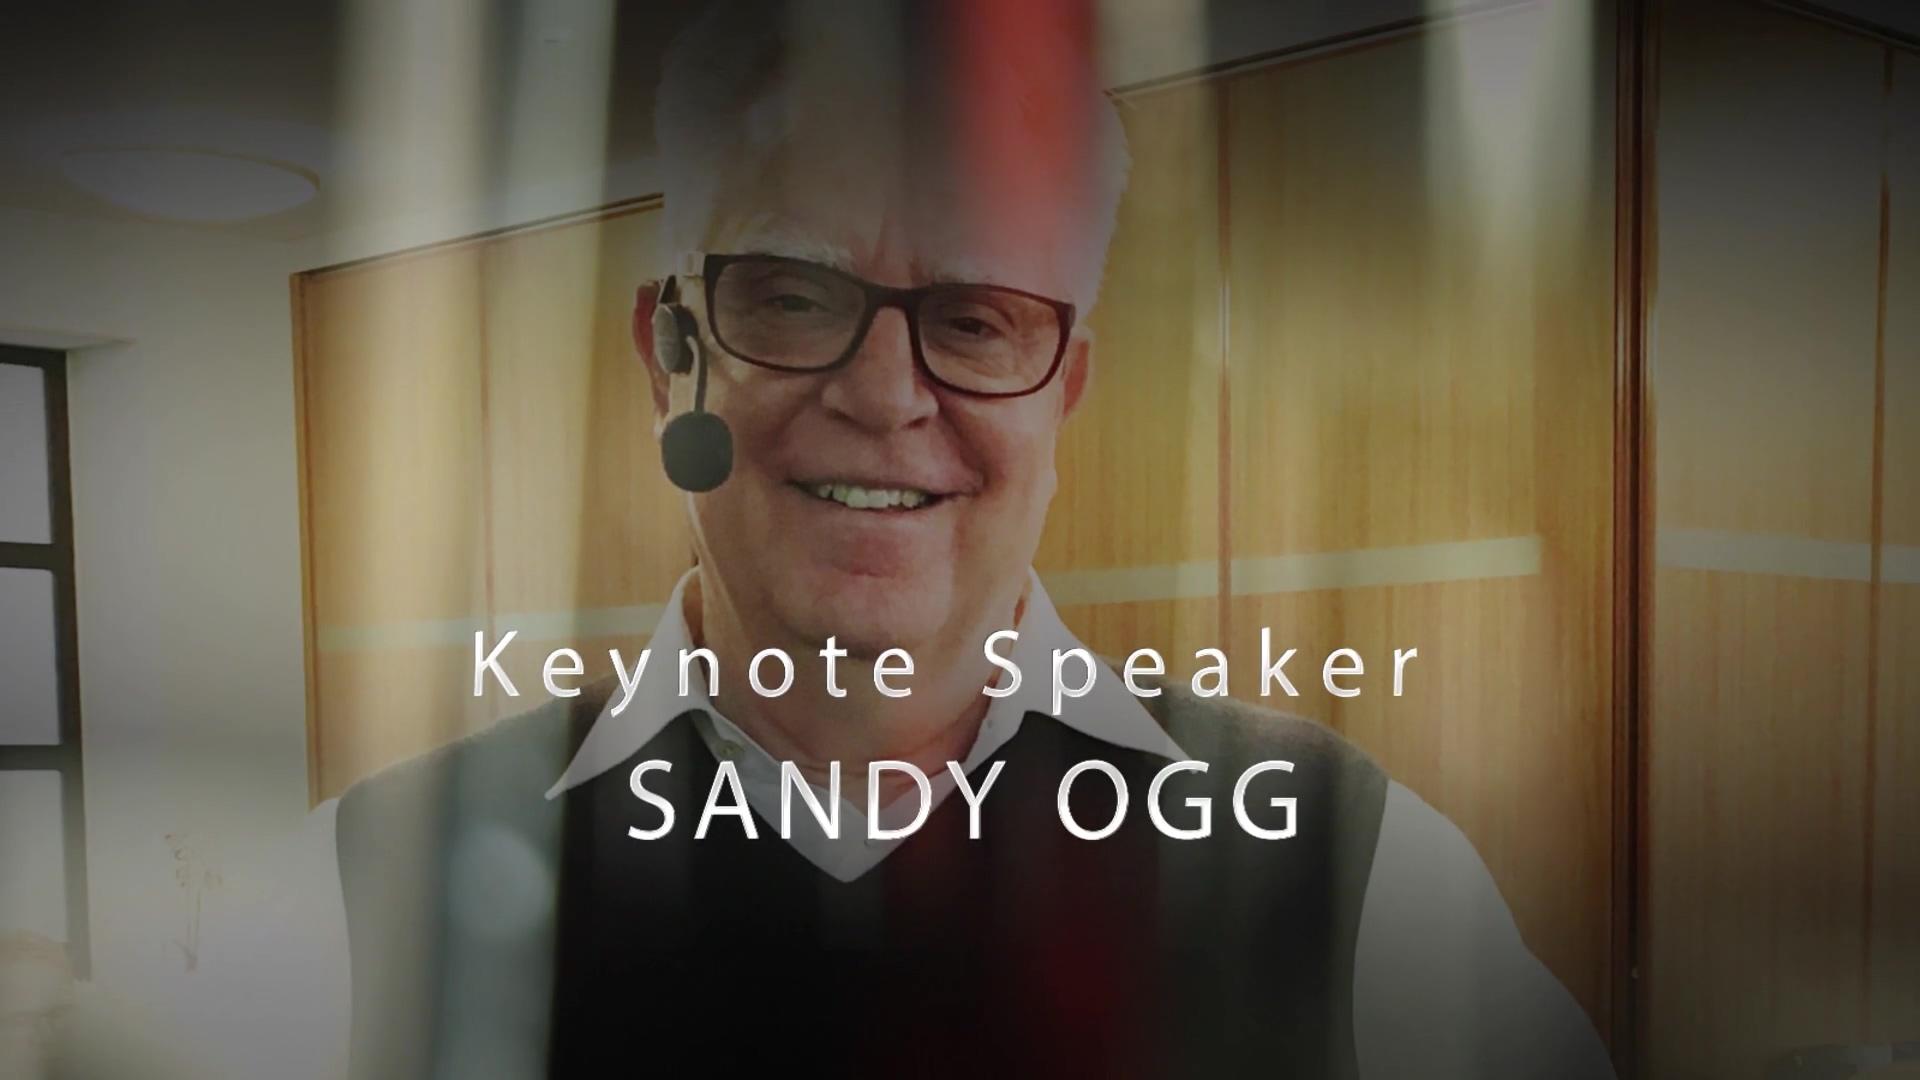 Sandy Ogg Keynote Speaker